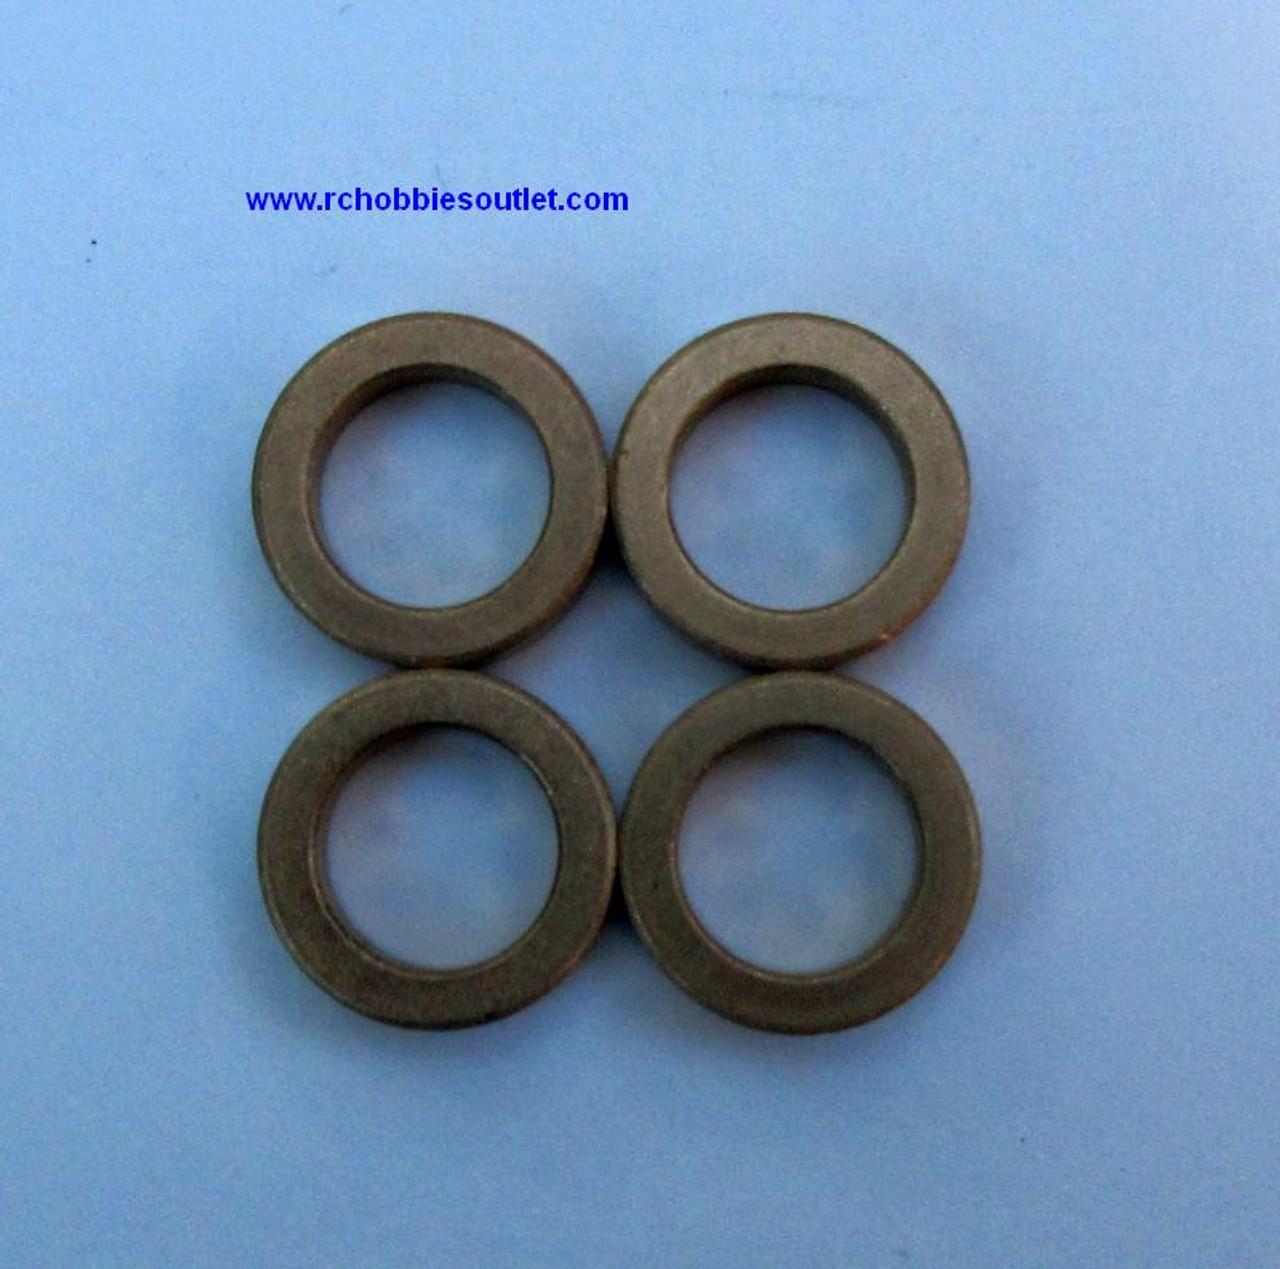 82833 Copper Bearings 15x10x4mm 1/16 Part HSP Redcat